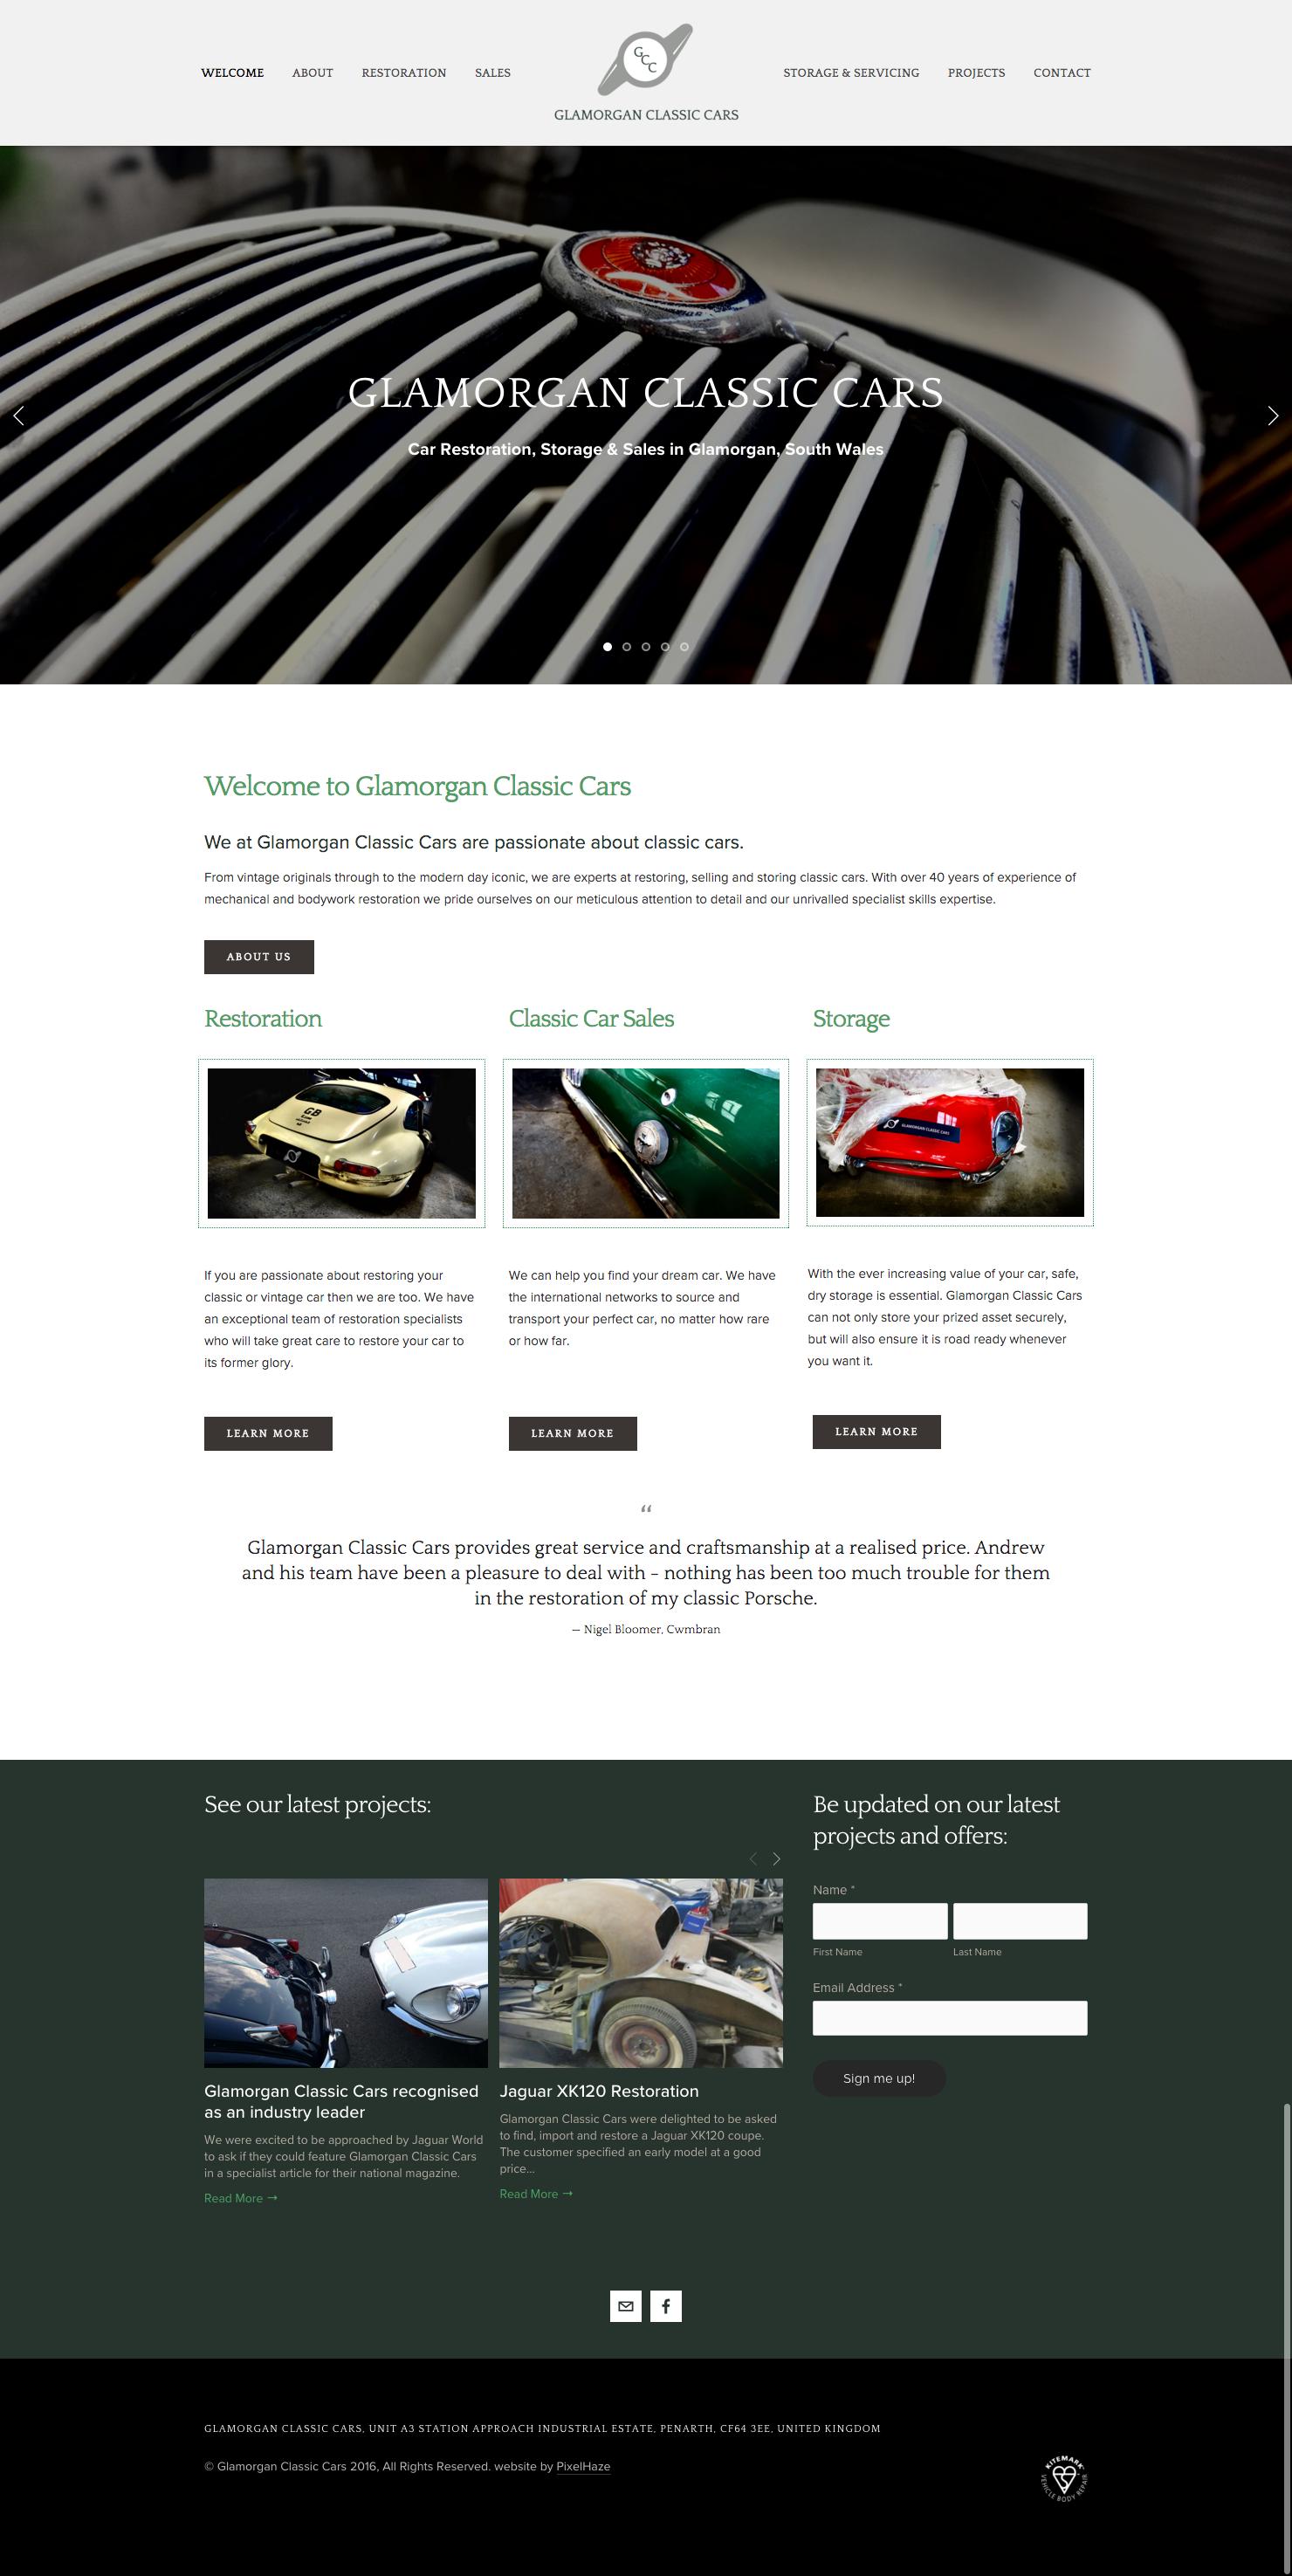 FireShot Capture 6 - Glamorgan Classic Cars - http___www.glamorganclassiccars.co.uk_.png